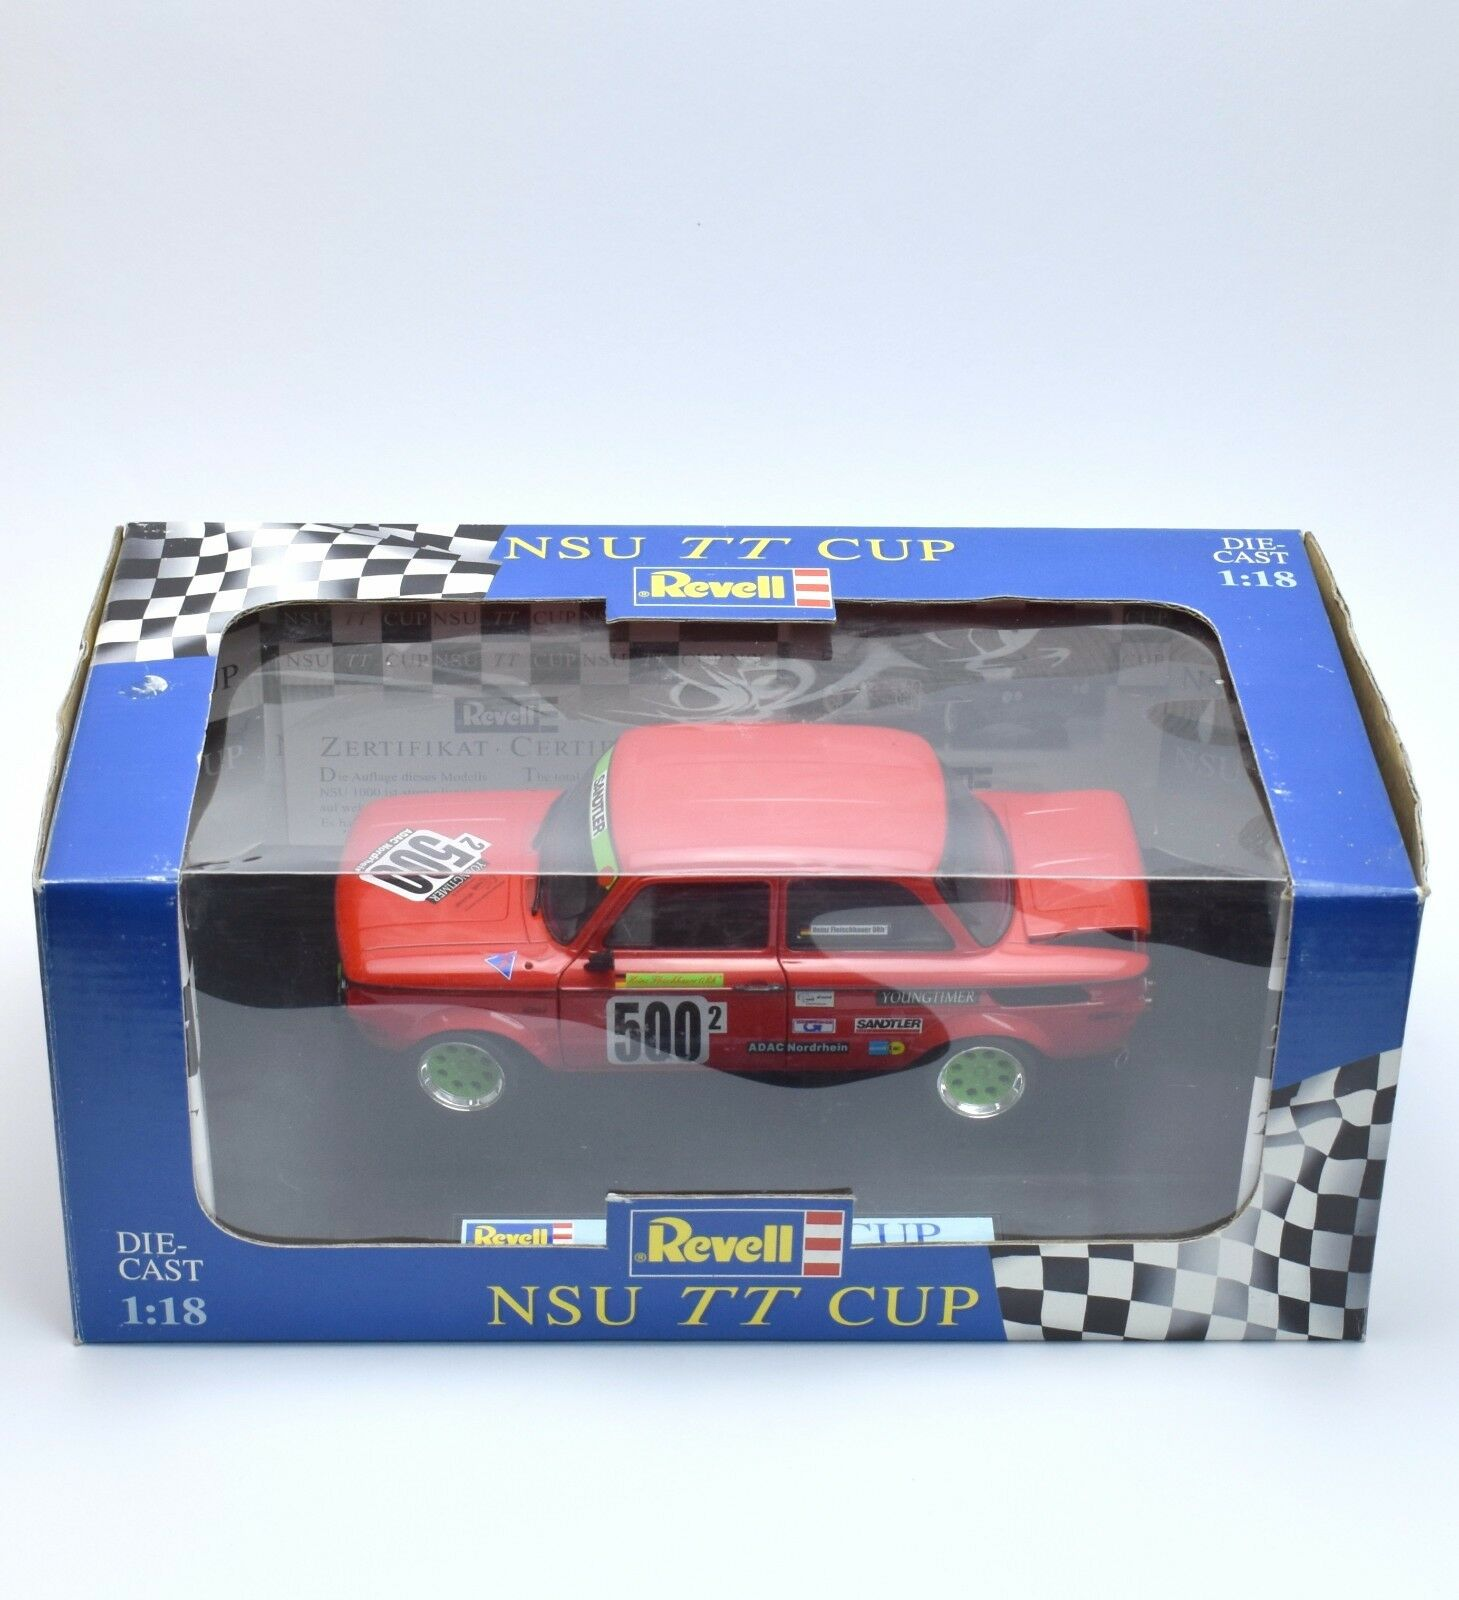 REVELL 08457 NSU 1000 Prinz TT CUP H. viande HAUER, certificat, 1 18, NEUF dans sa boîte, k033